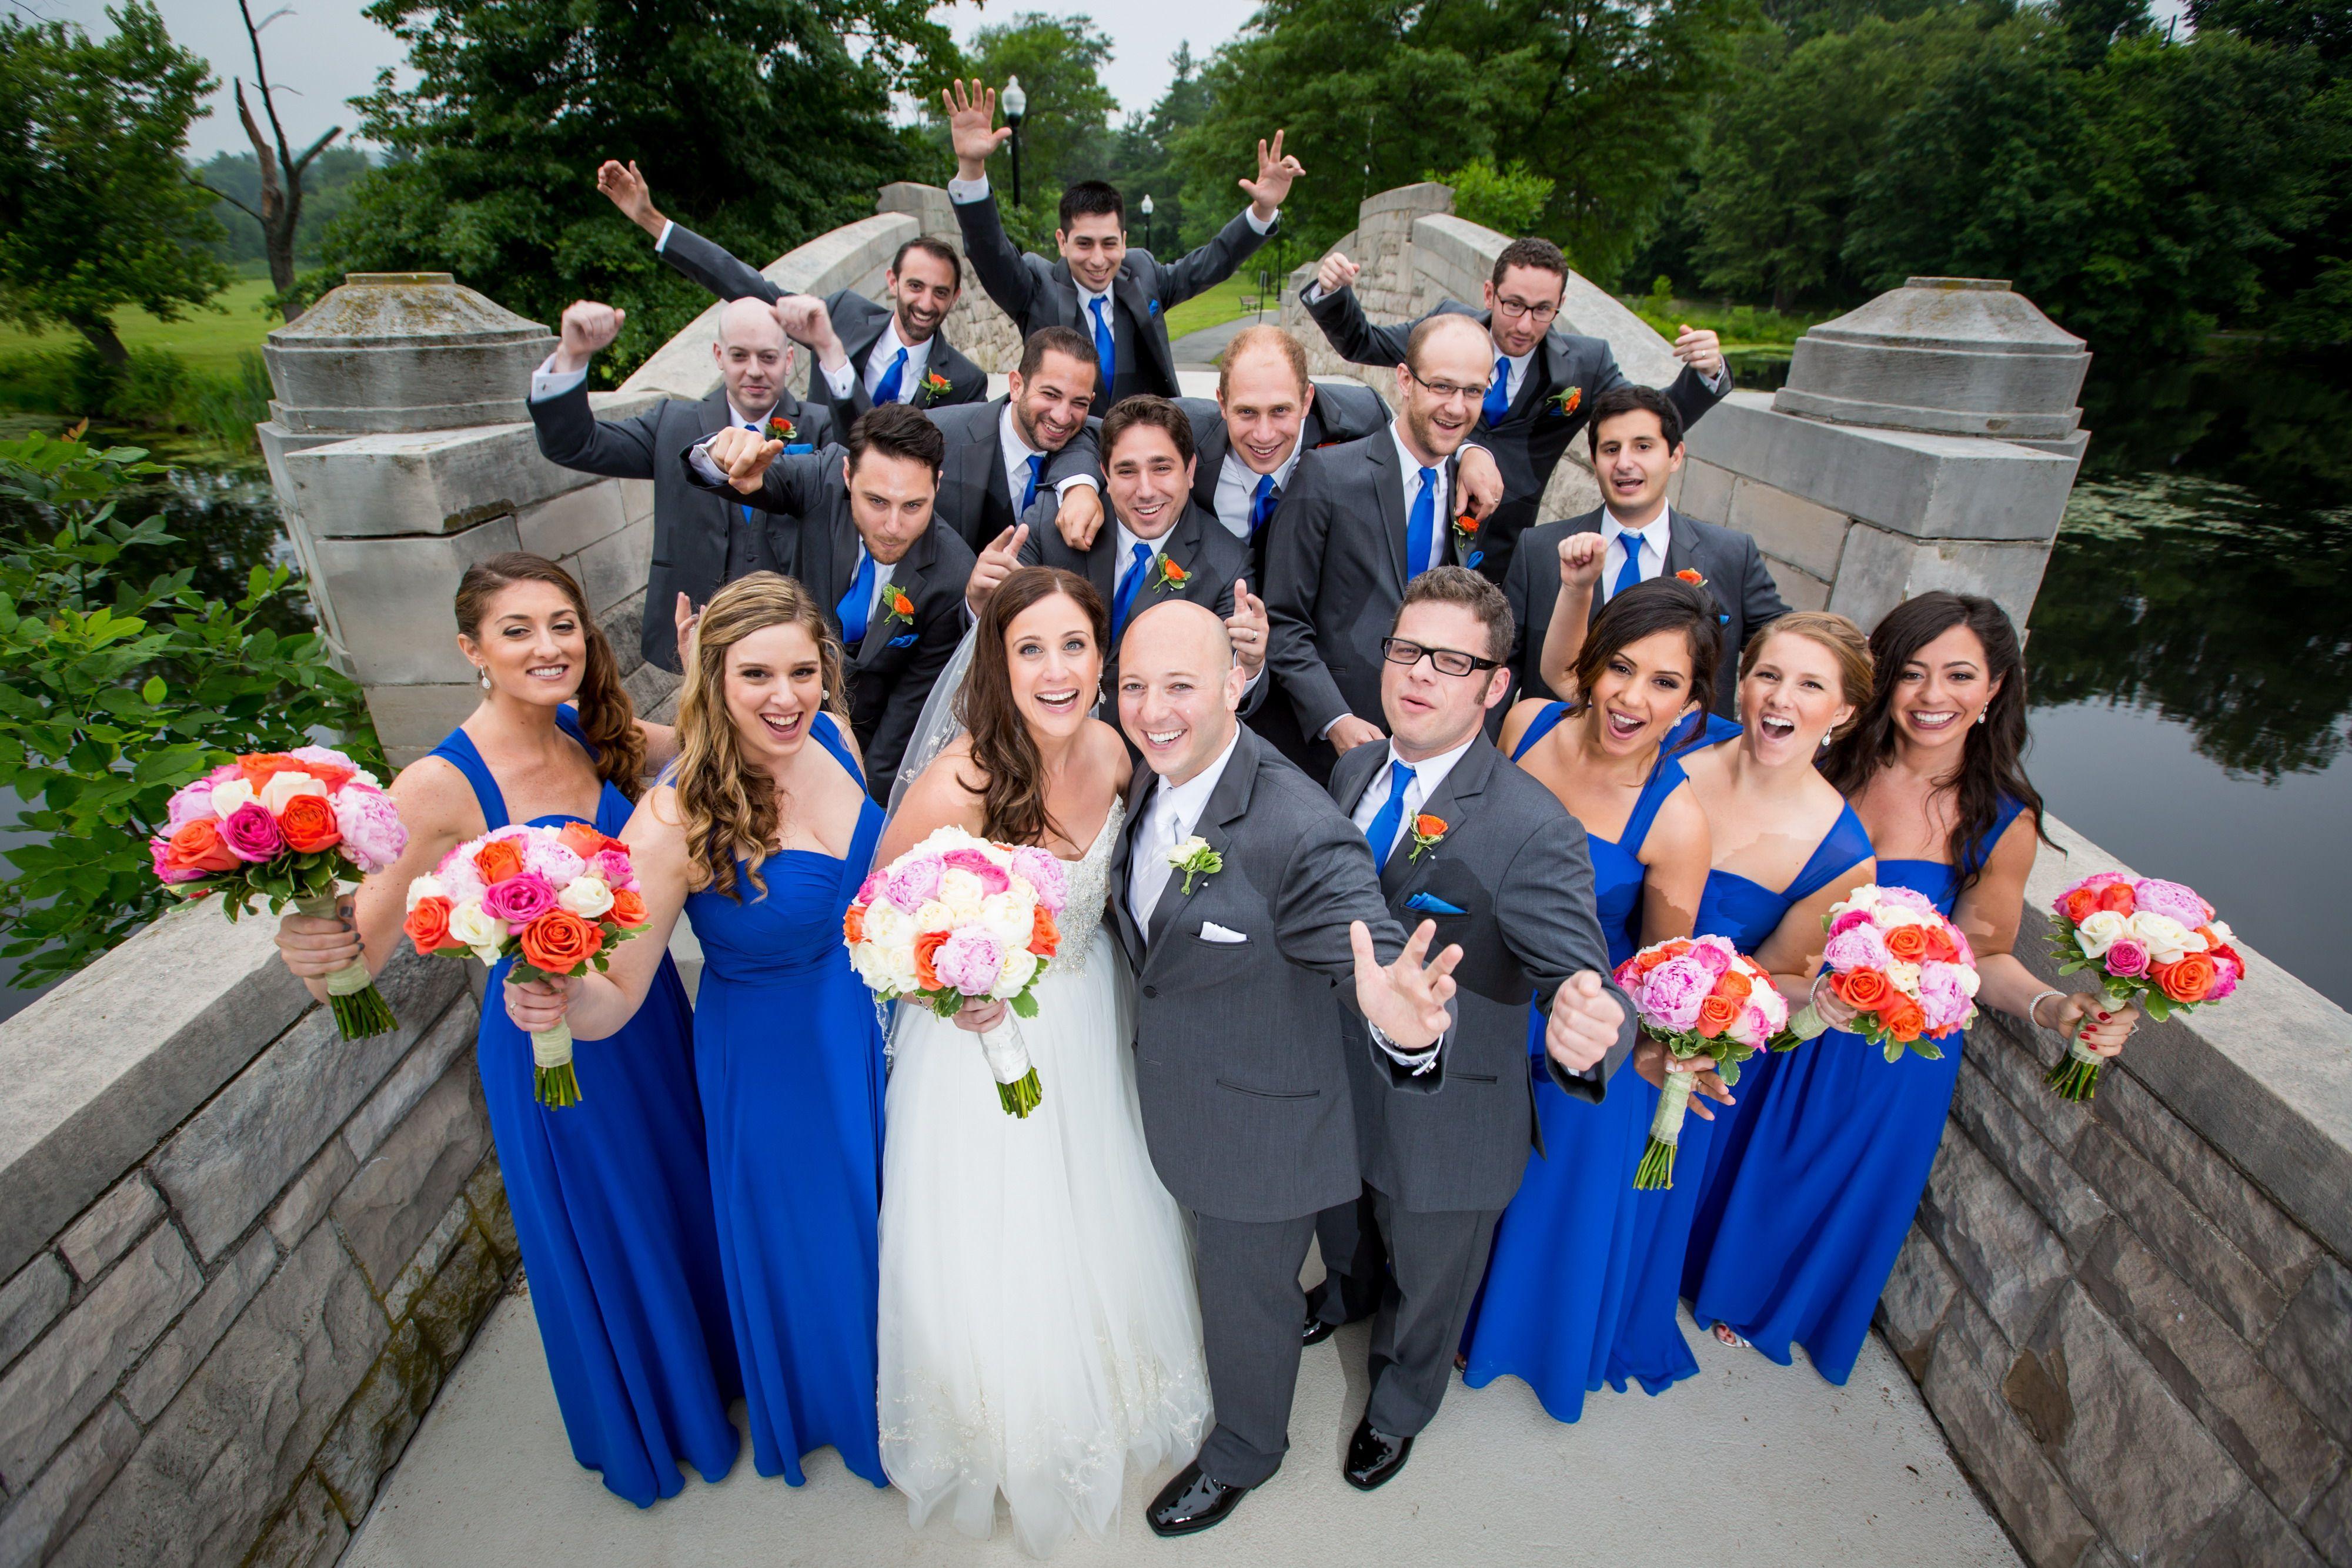 dresses wedding blouson gown blue bridal papell art bls bridesmaid adrianna deco regular gowns beaded bridesmaids lighting light default